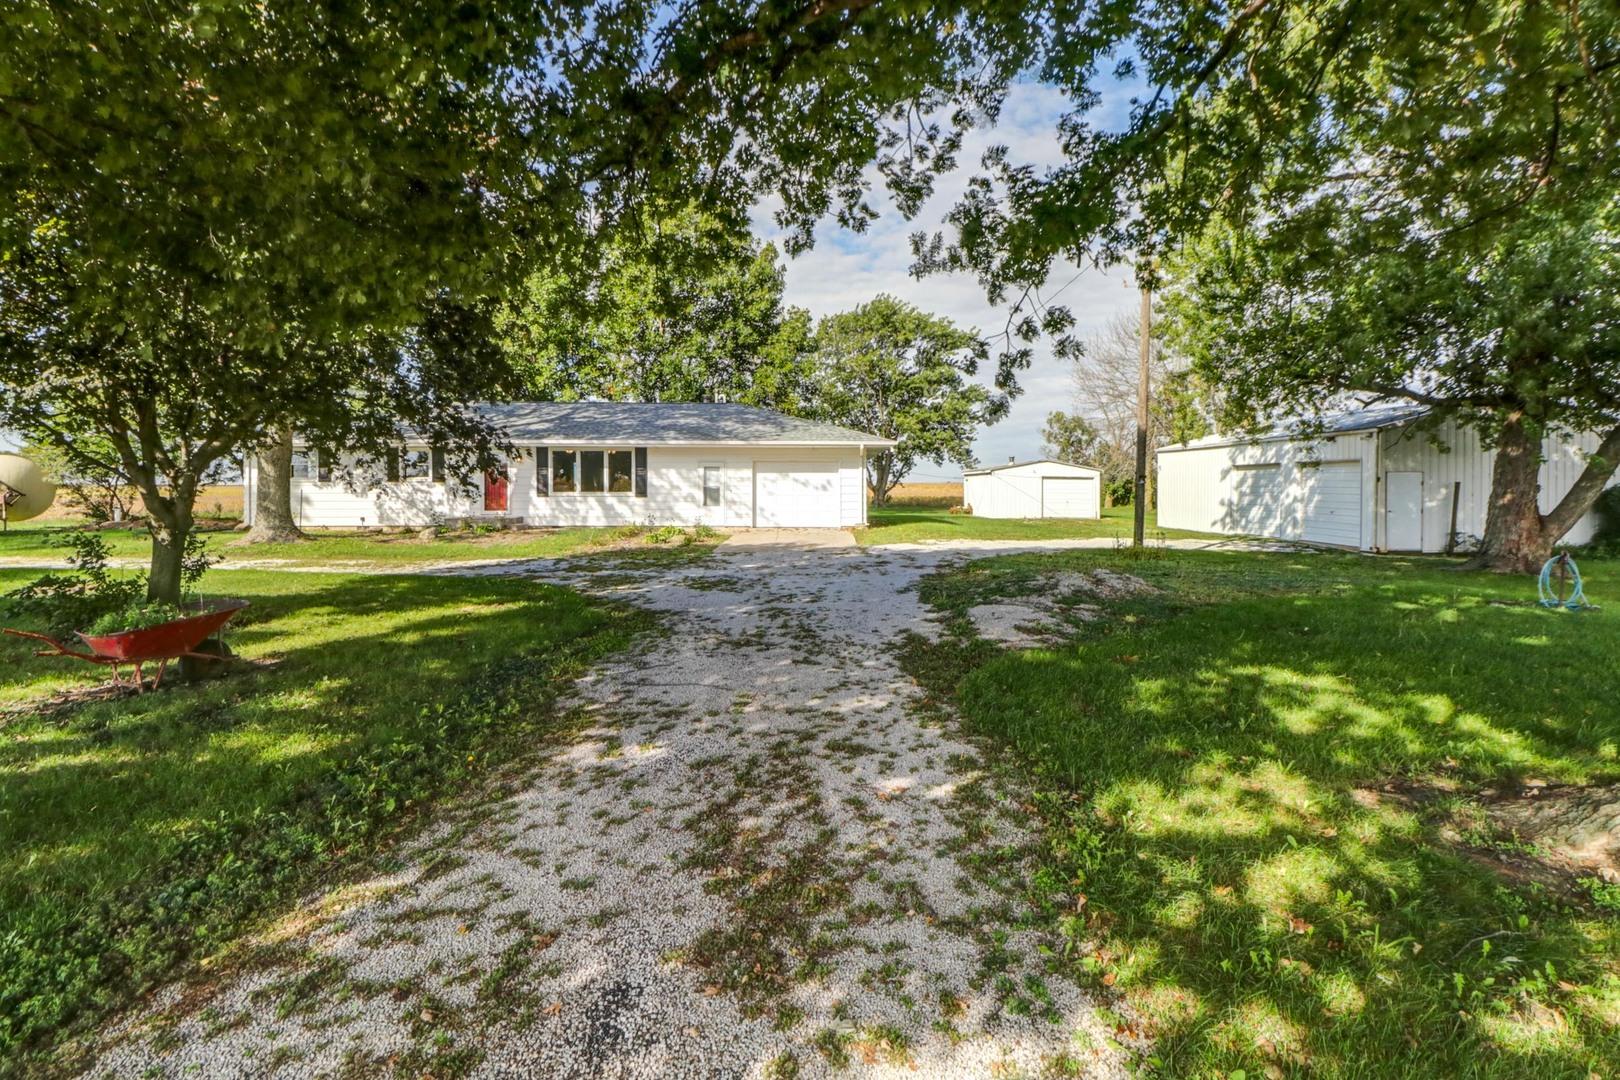 2073 County Road 2300, St. Joseph, Illinois, 61873